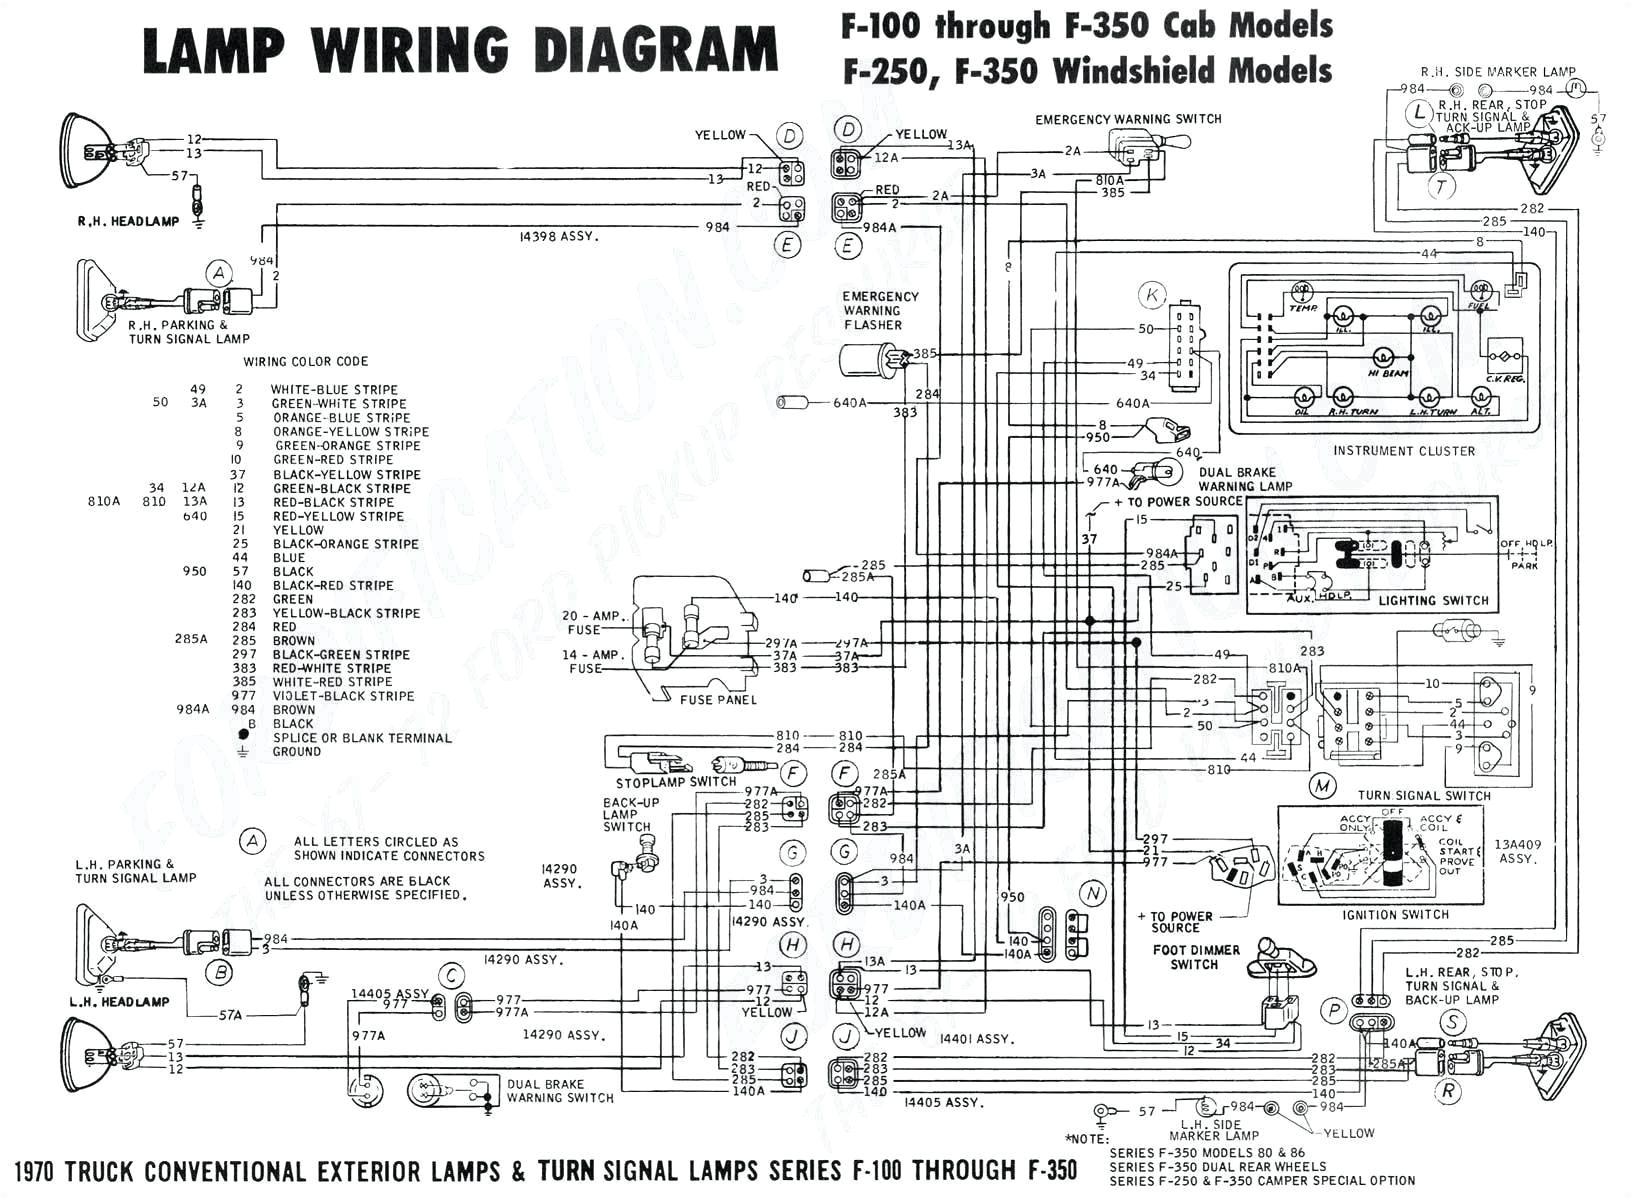 chevy silverado tail light wiring diagram wiring diagram for bulkhead lights 2019 2005 chevy silverado tail light wiring diagram unique lovely trailer 1g jpg